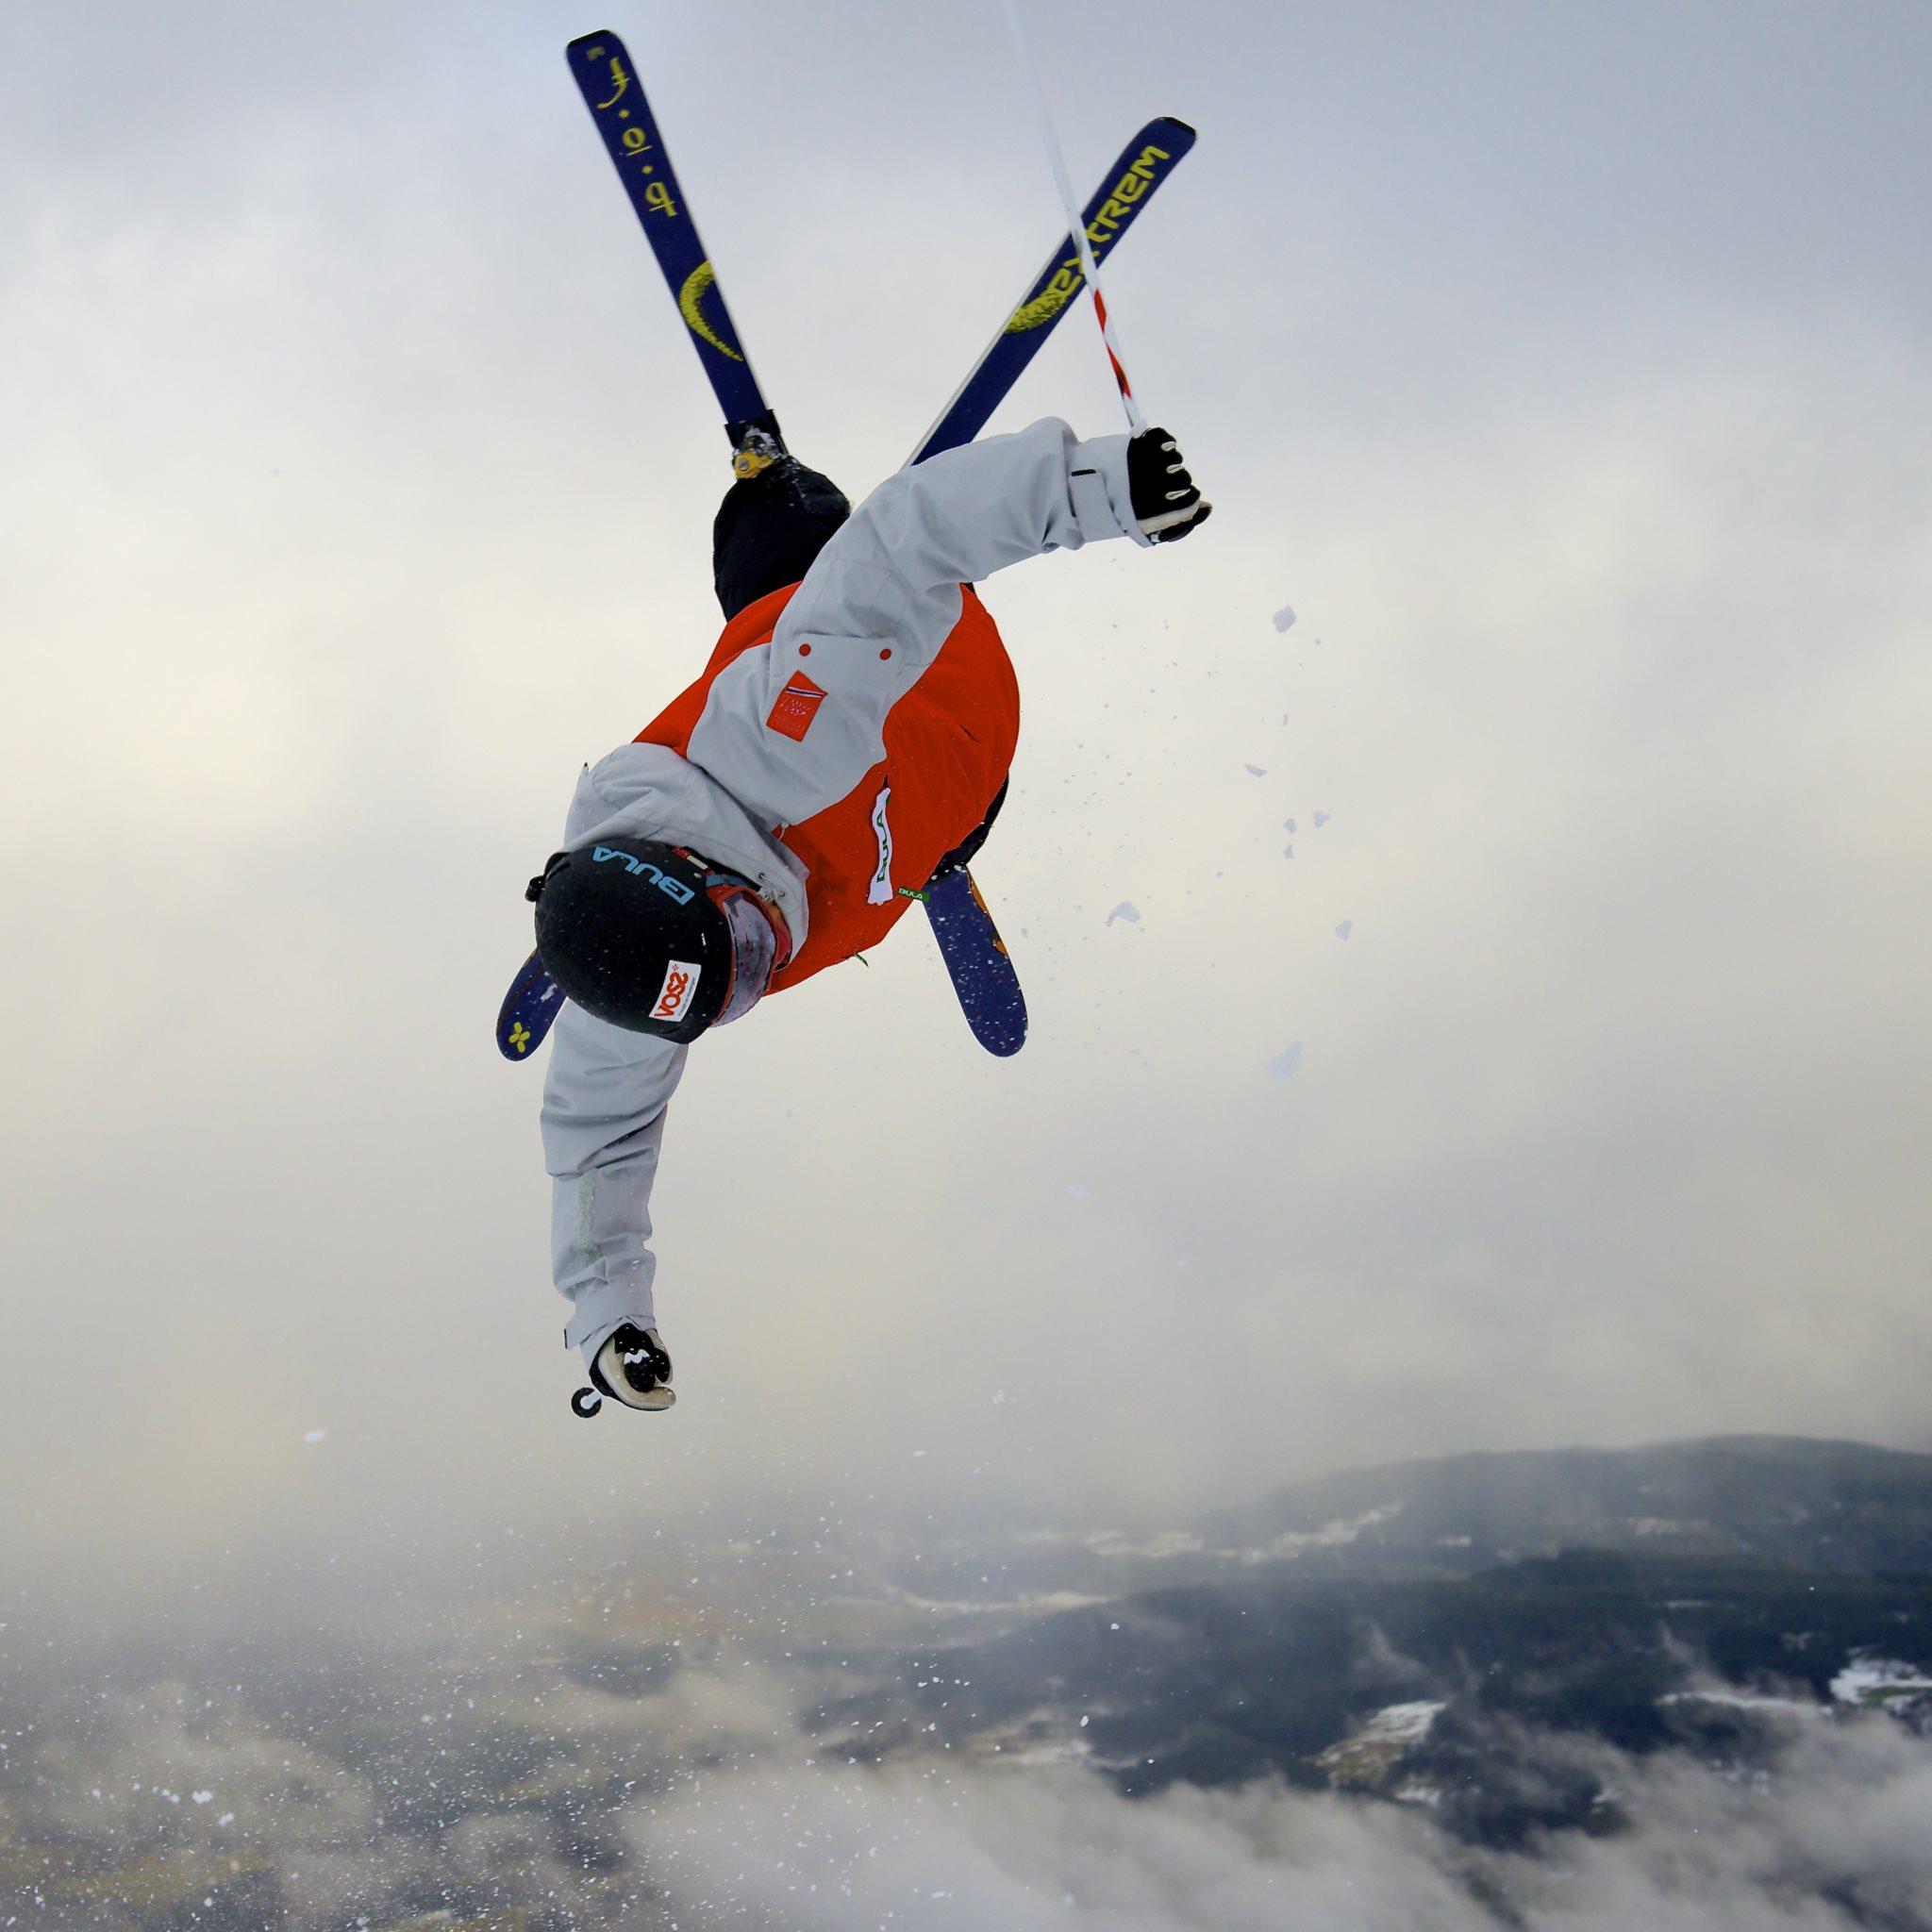 freestyle skiing wallpaper - photo #19